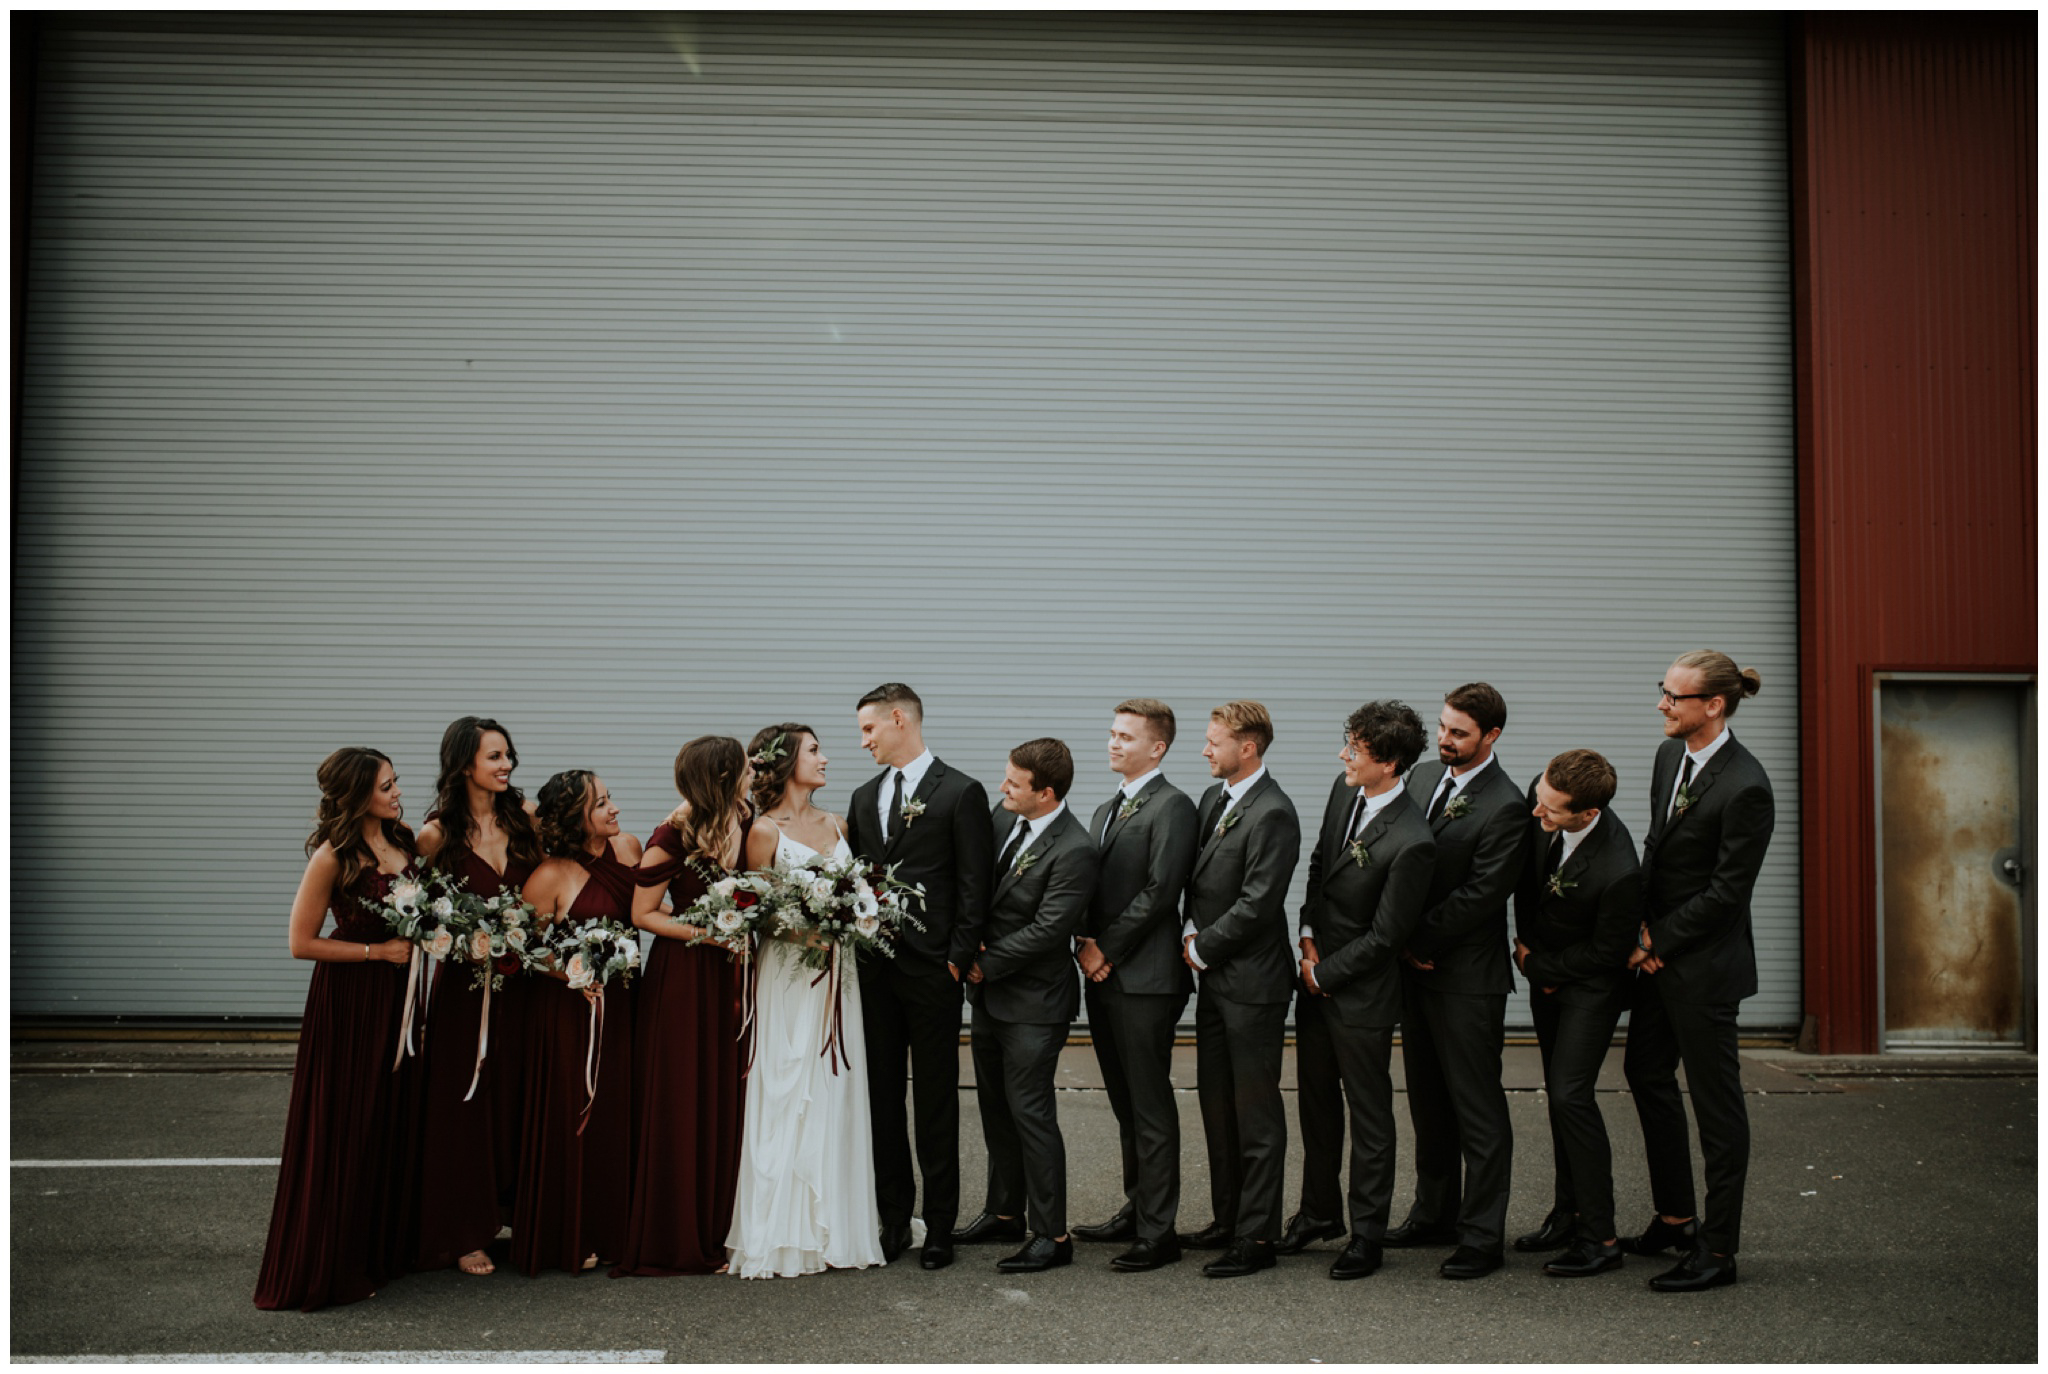 alyssa-keiran-westland-distillery-urban-seattle-wedding-photographer-caitlyn-nikula-80.jpg